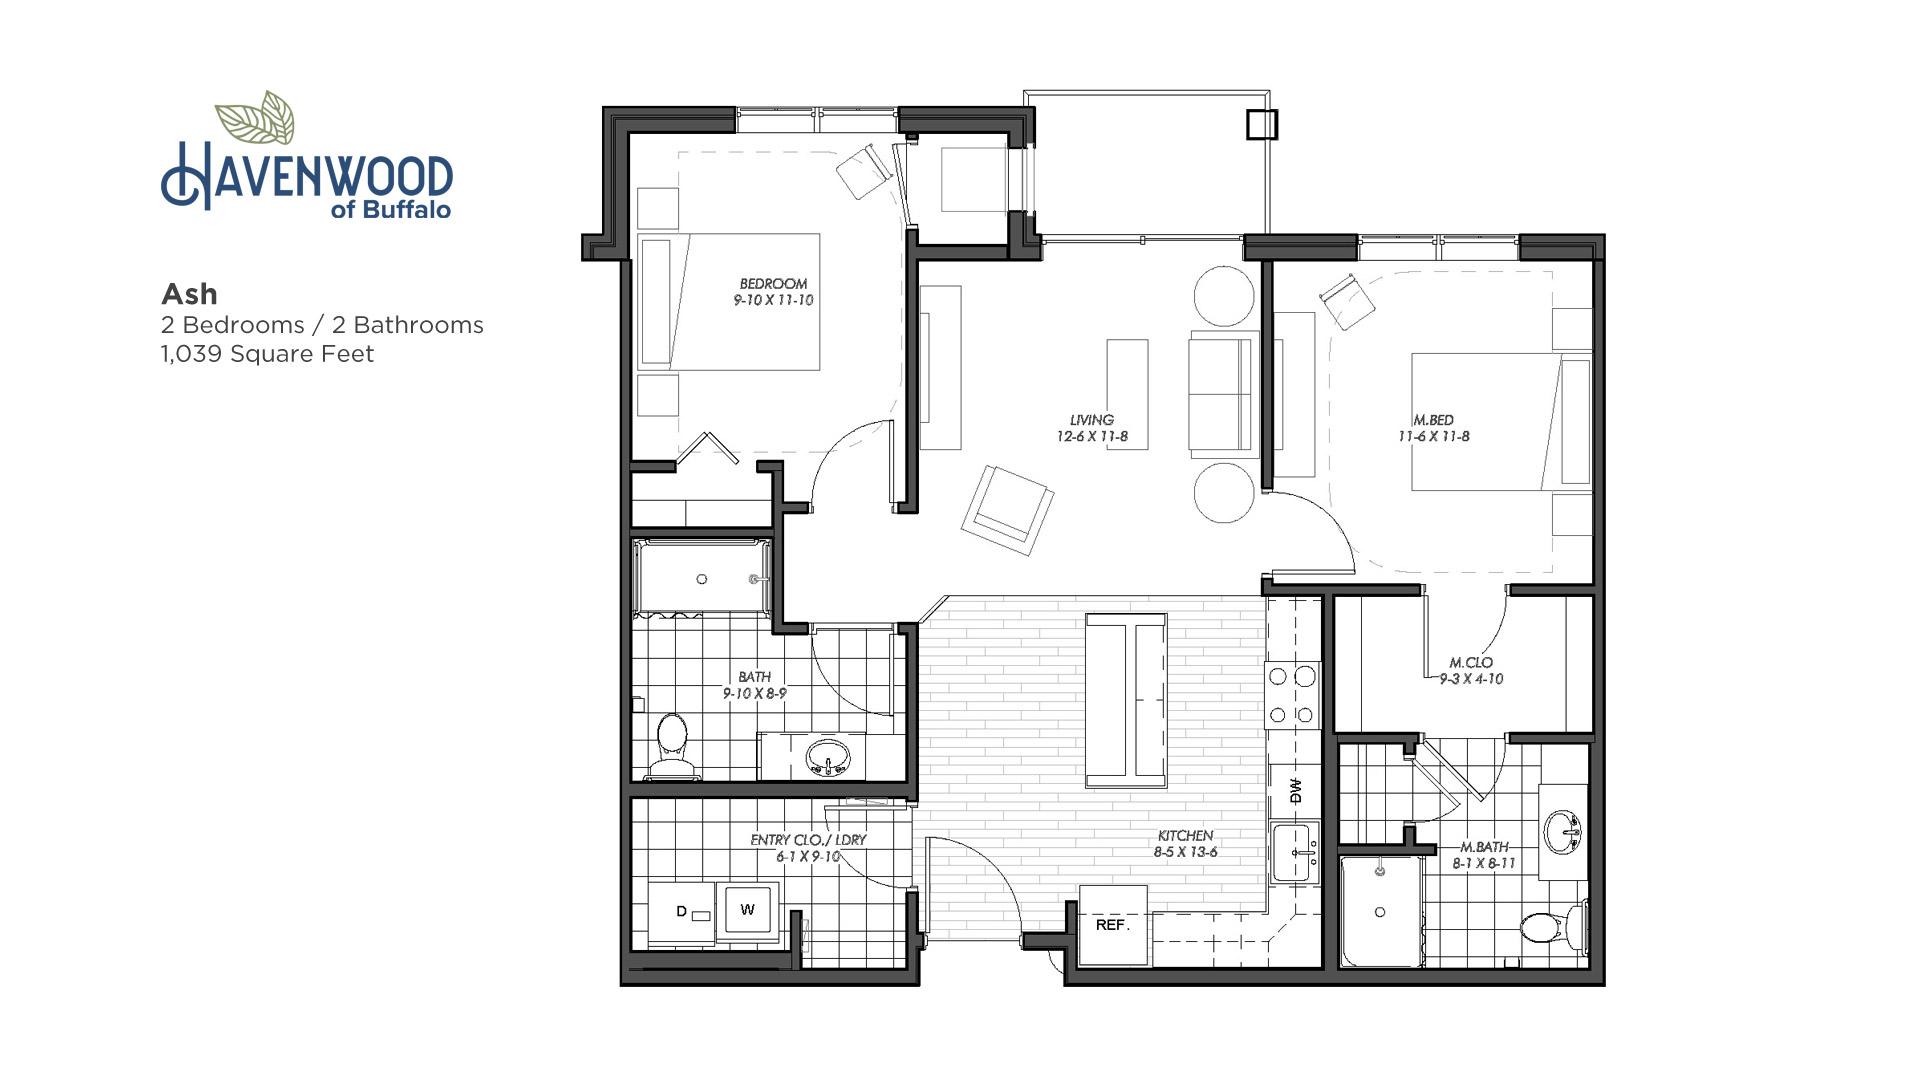 Havenwood of Buffalo Ash Floor Plan